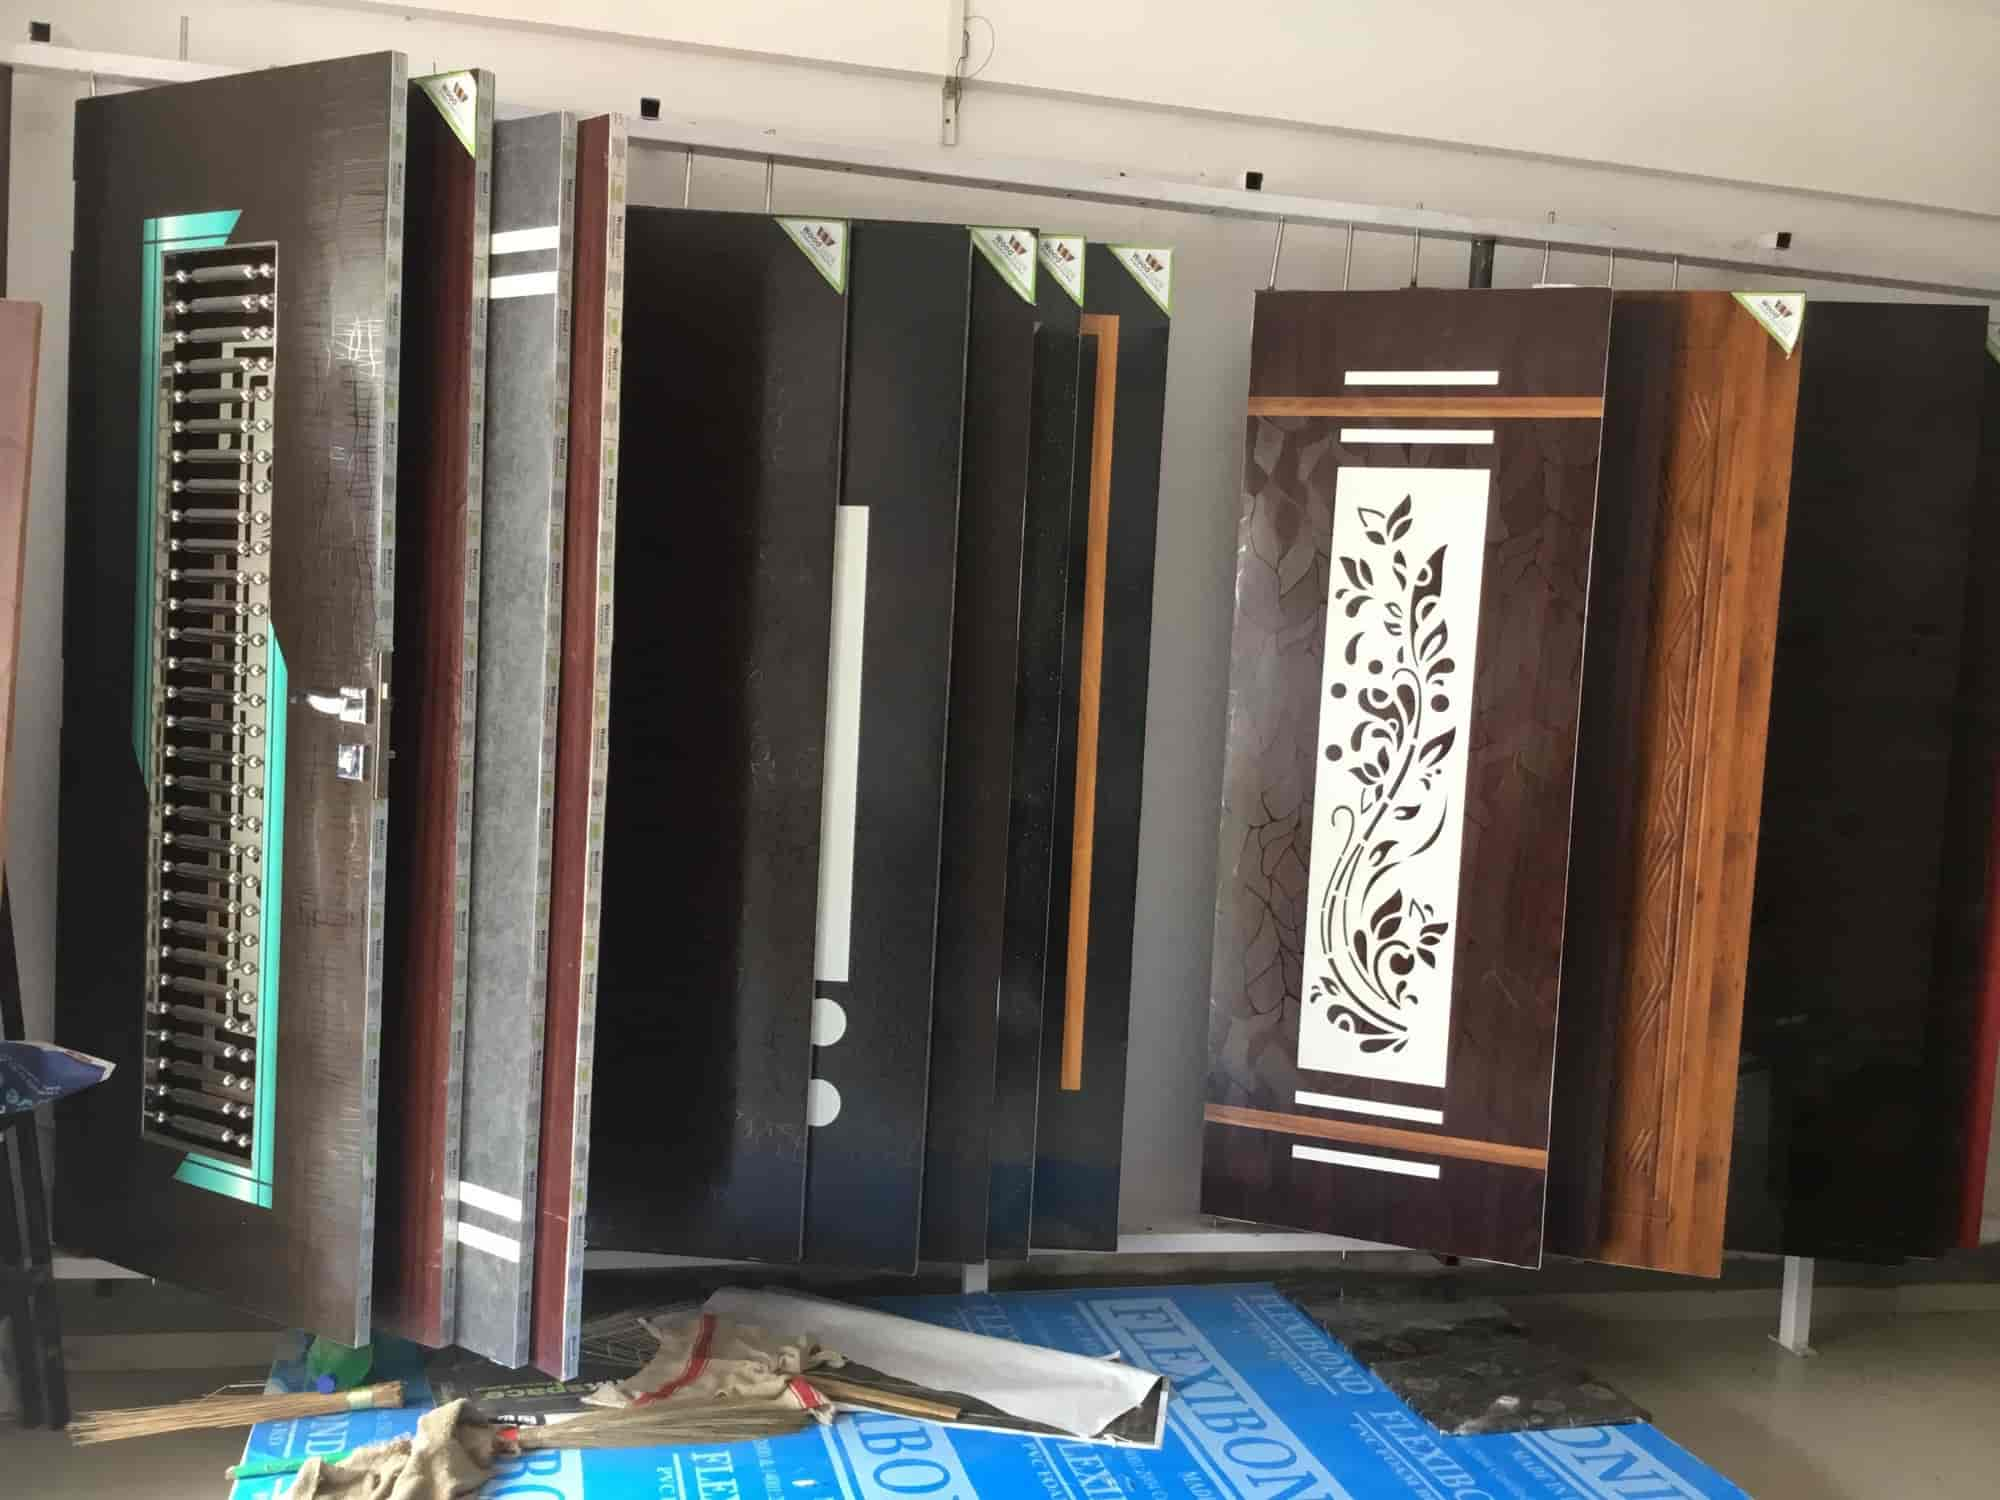 revolving chair manufacturers in vadodara p pod measurements shakti doors and ifd